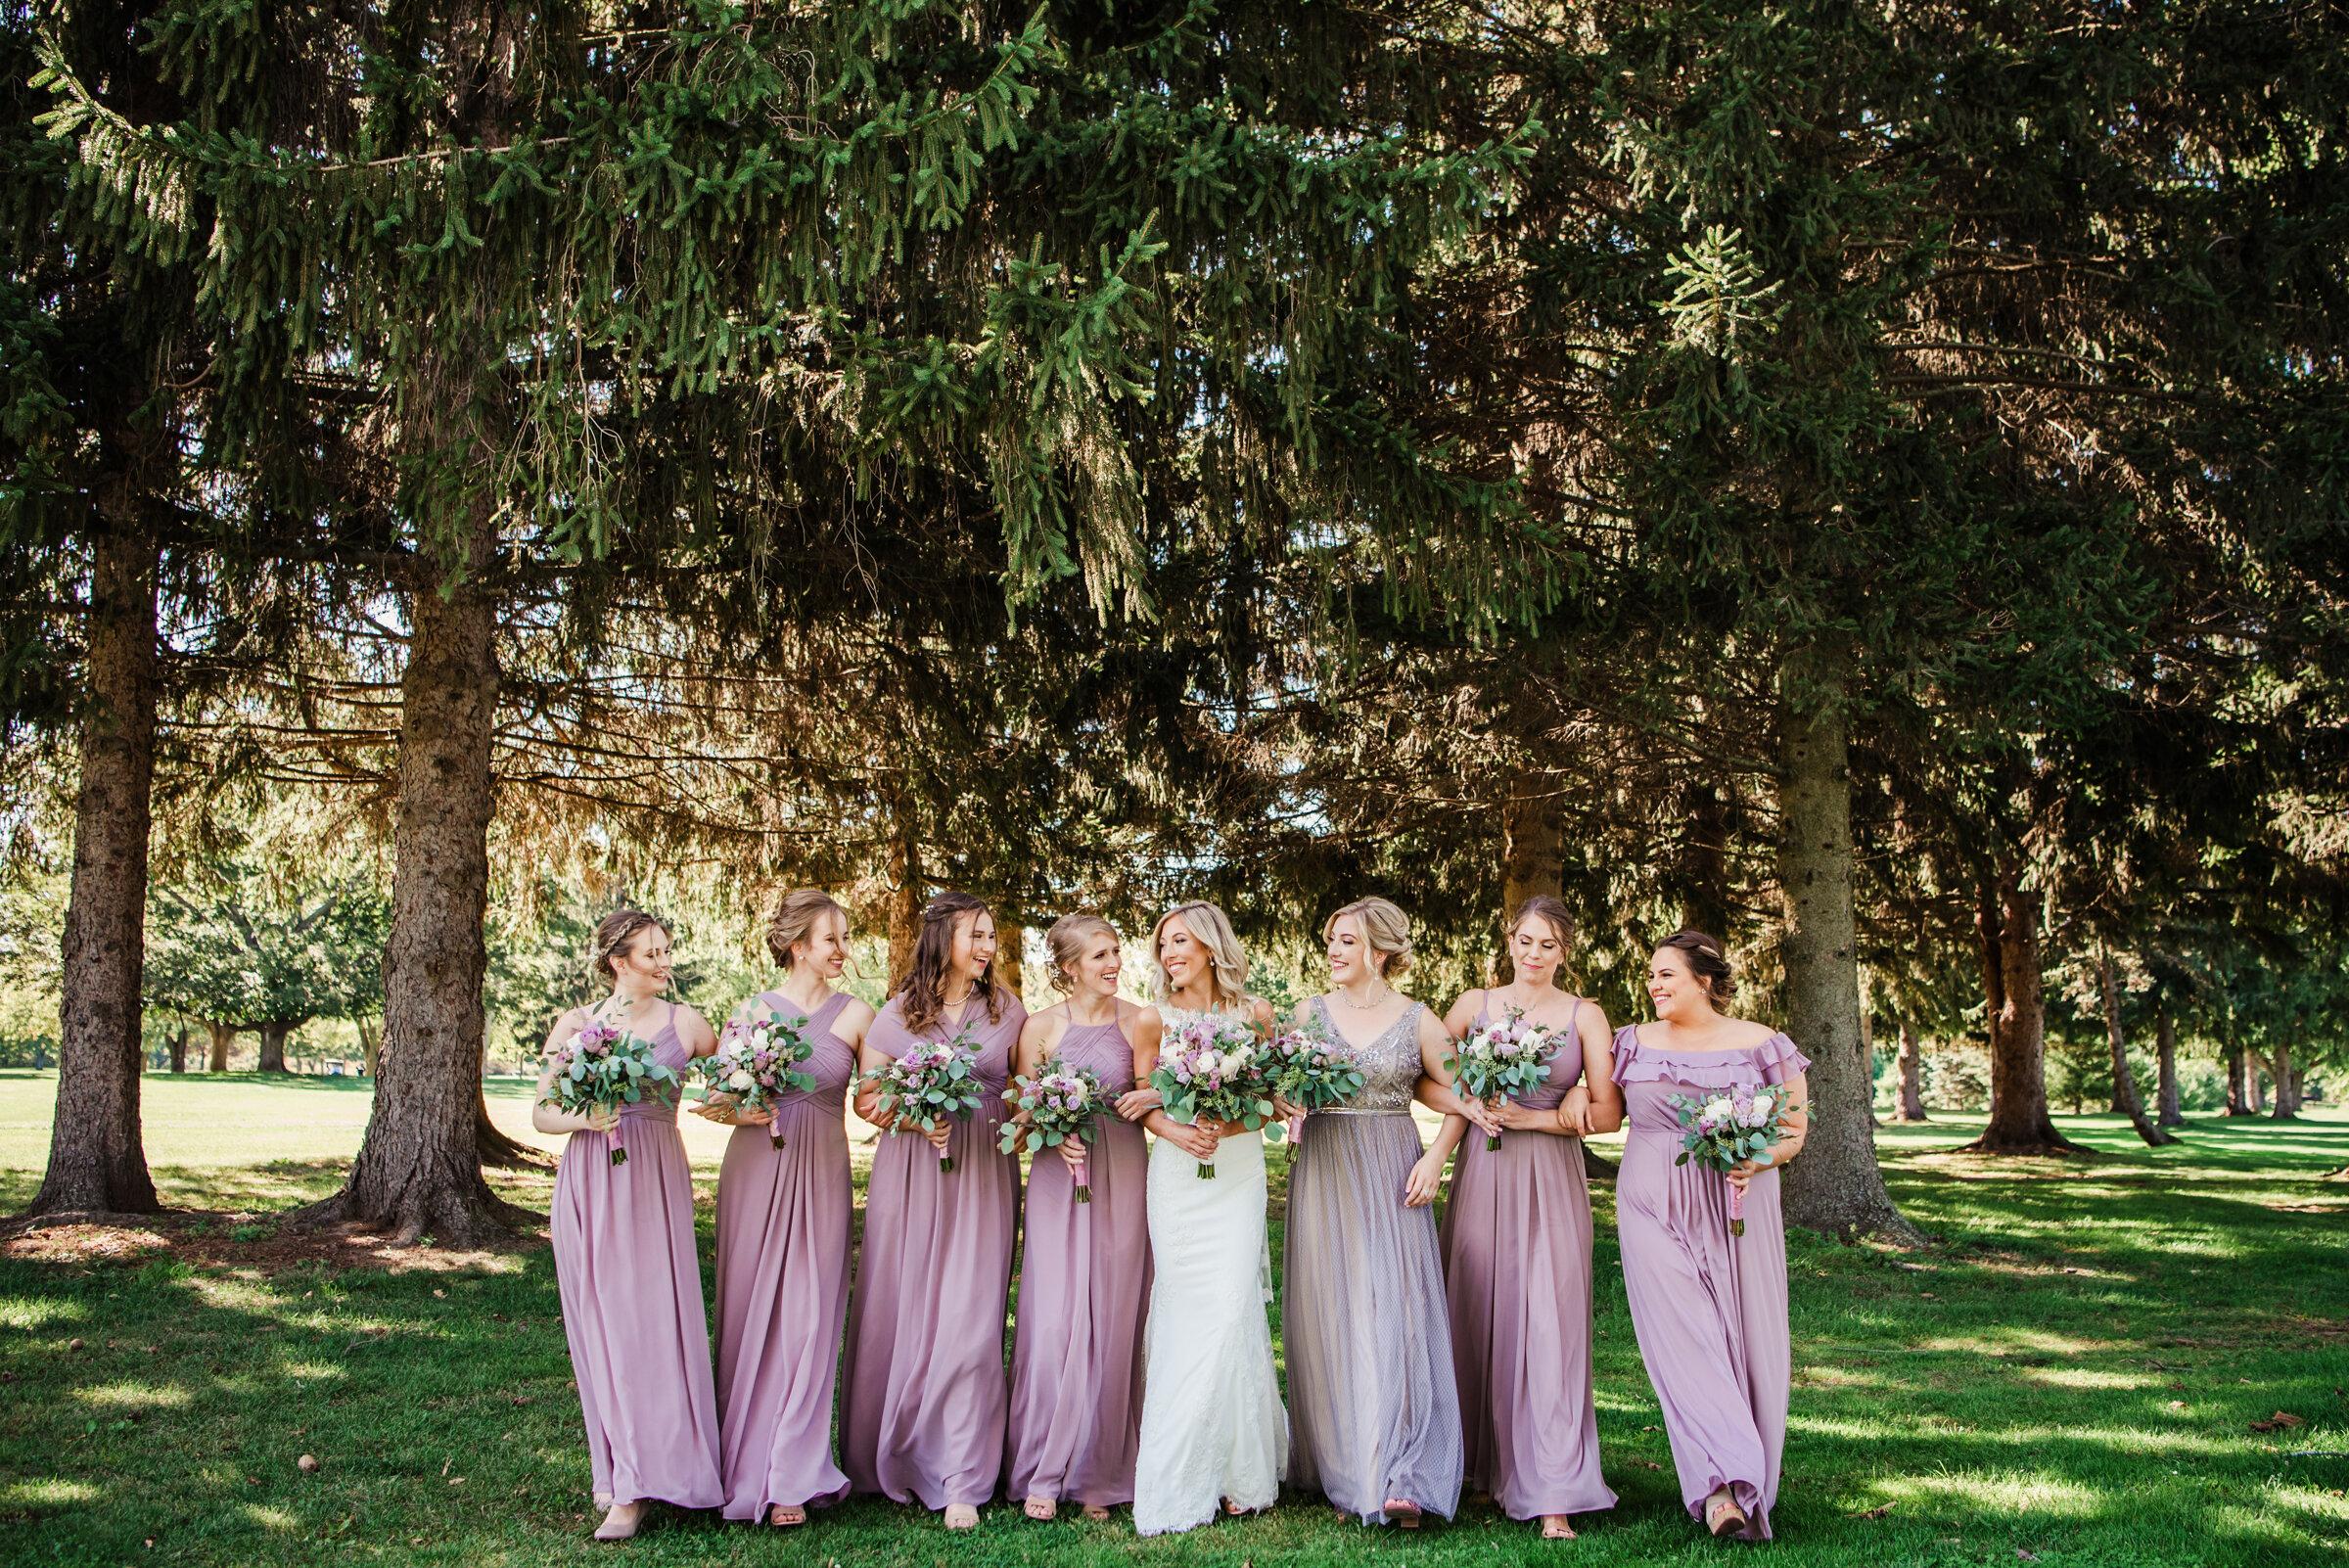 Deerfield_Country_Club_Rochester_Wedding_JILL_STUDIO_Rochester_NY_Photographer_DSC_6077.jpg